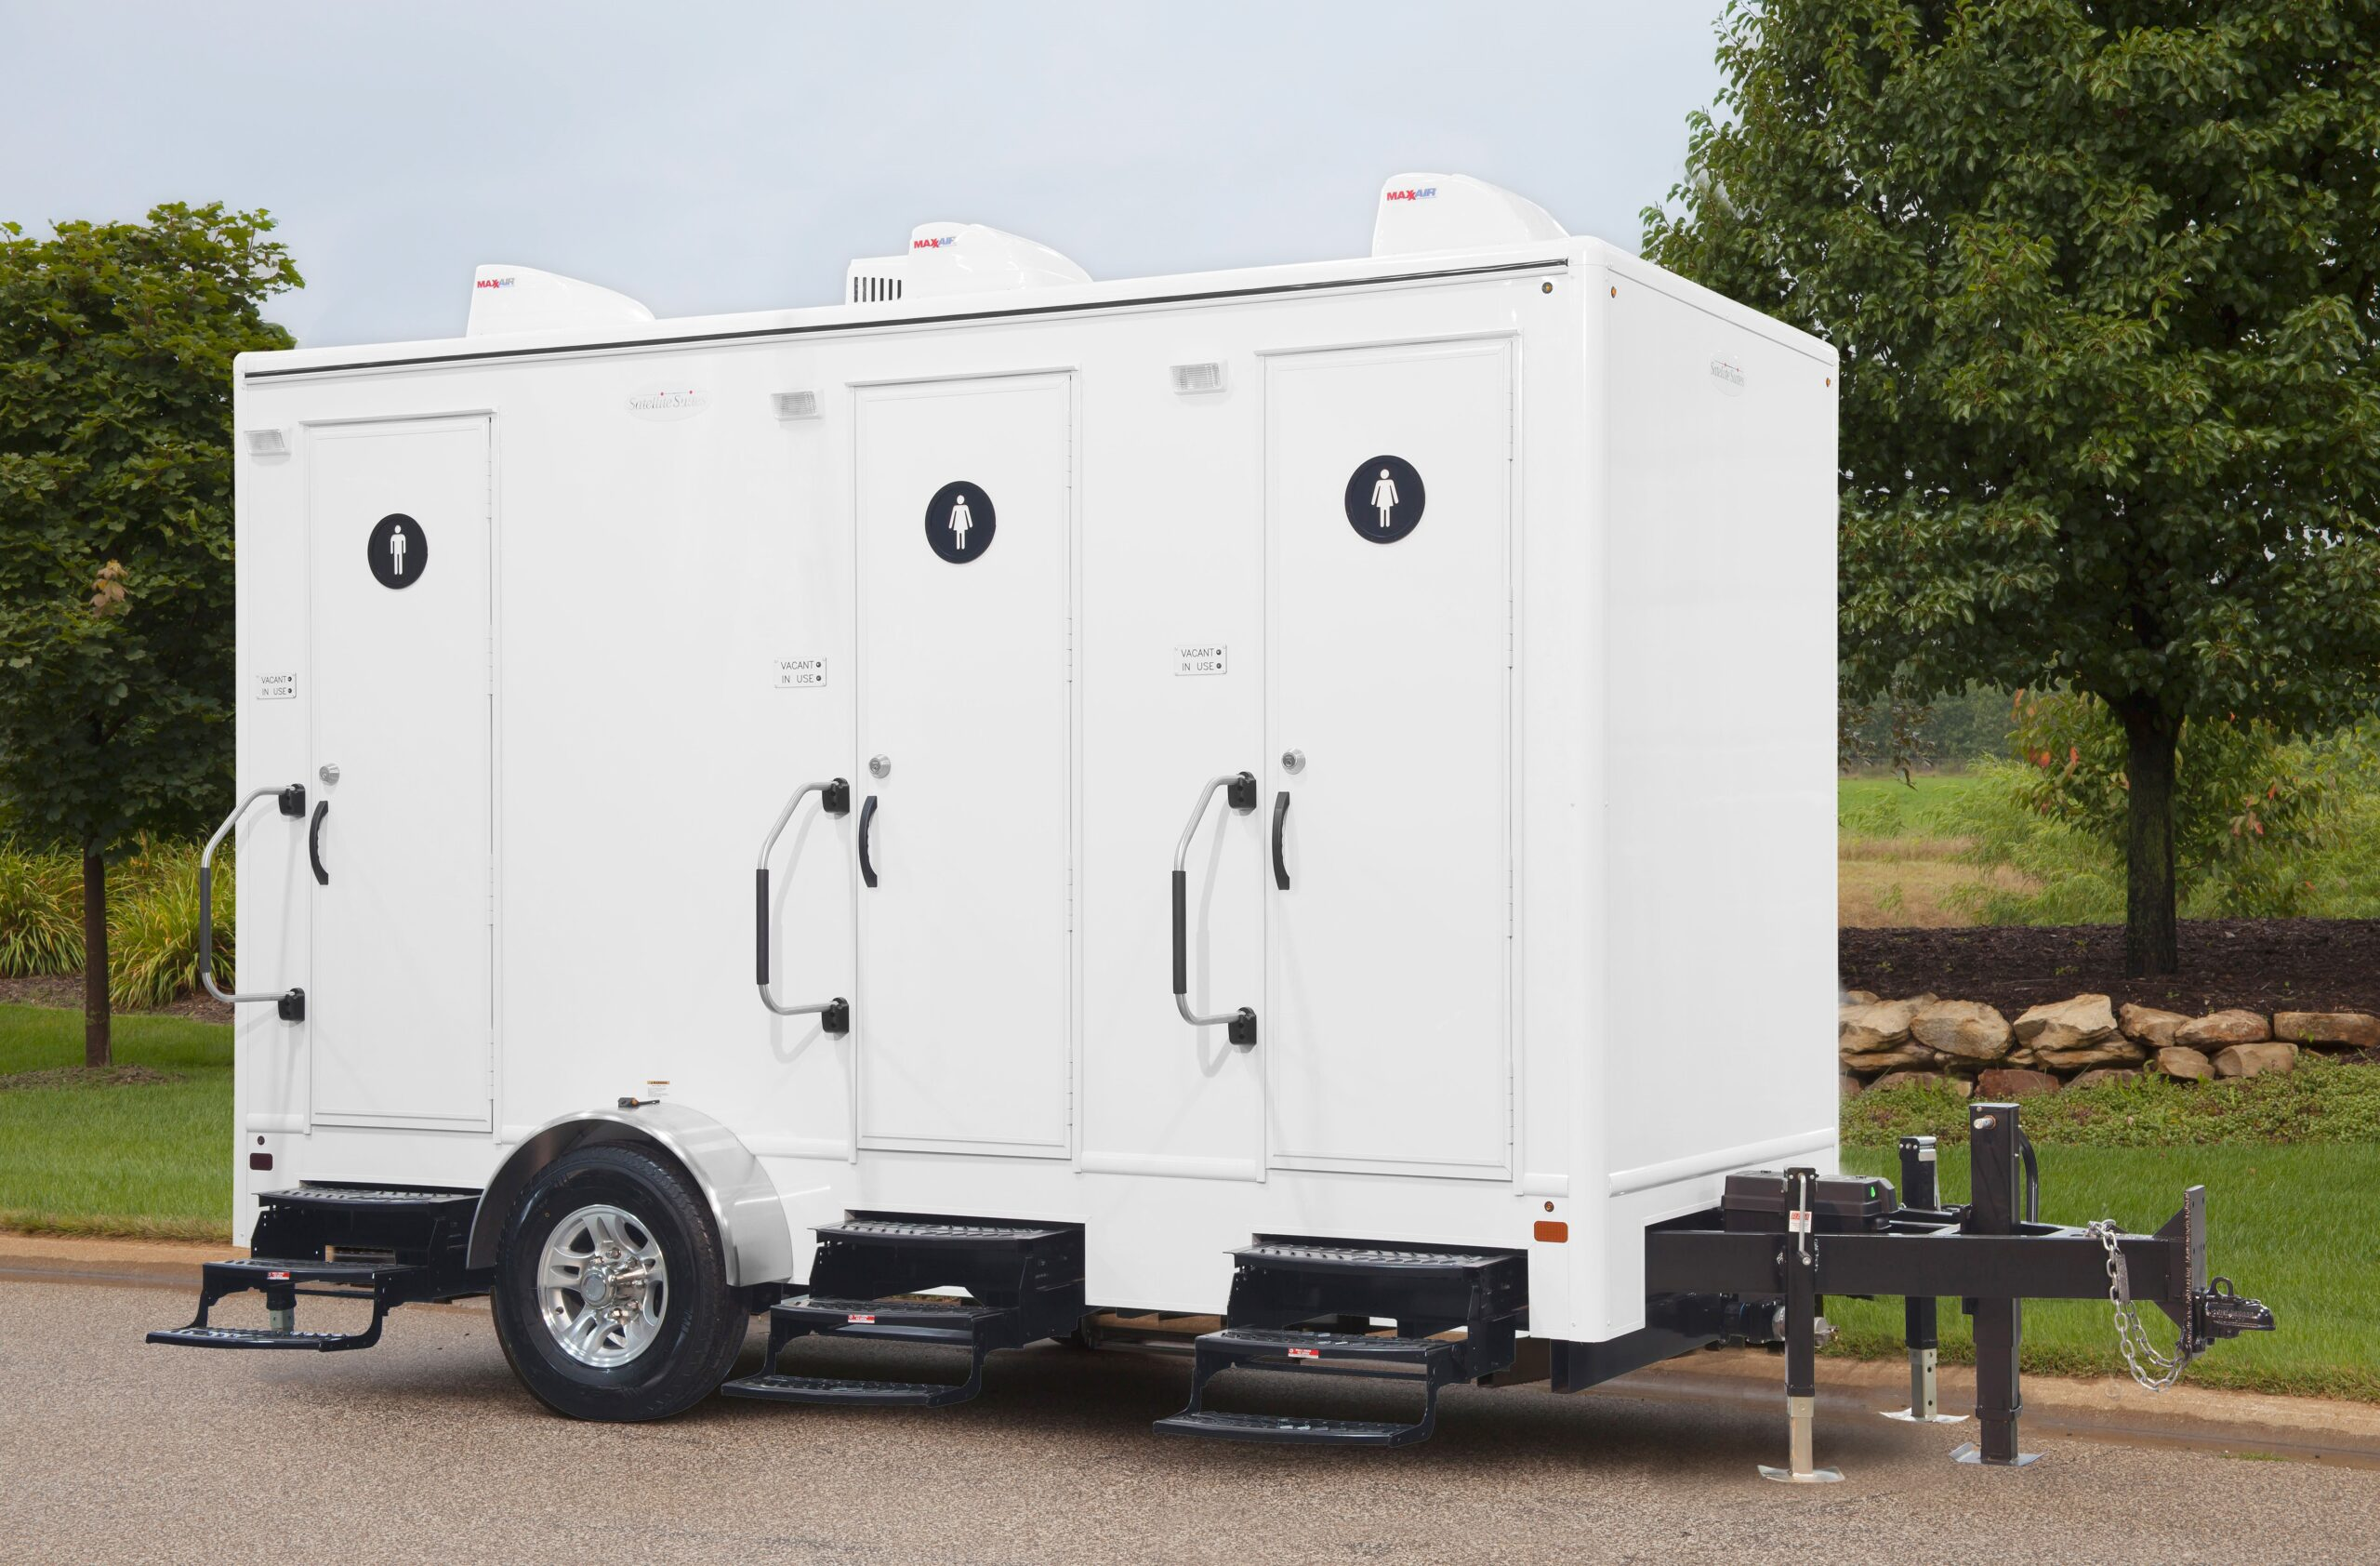 Porta Potty Rental Trailer - 14-foot